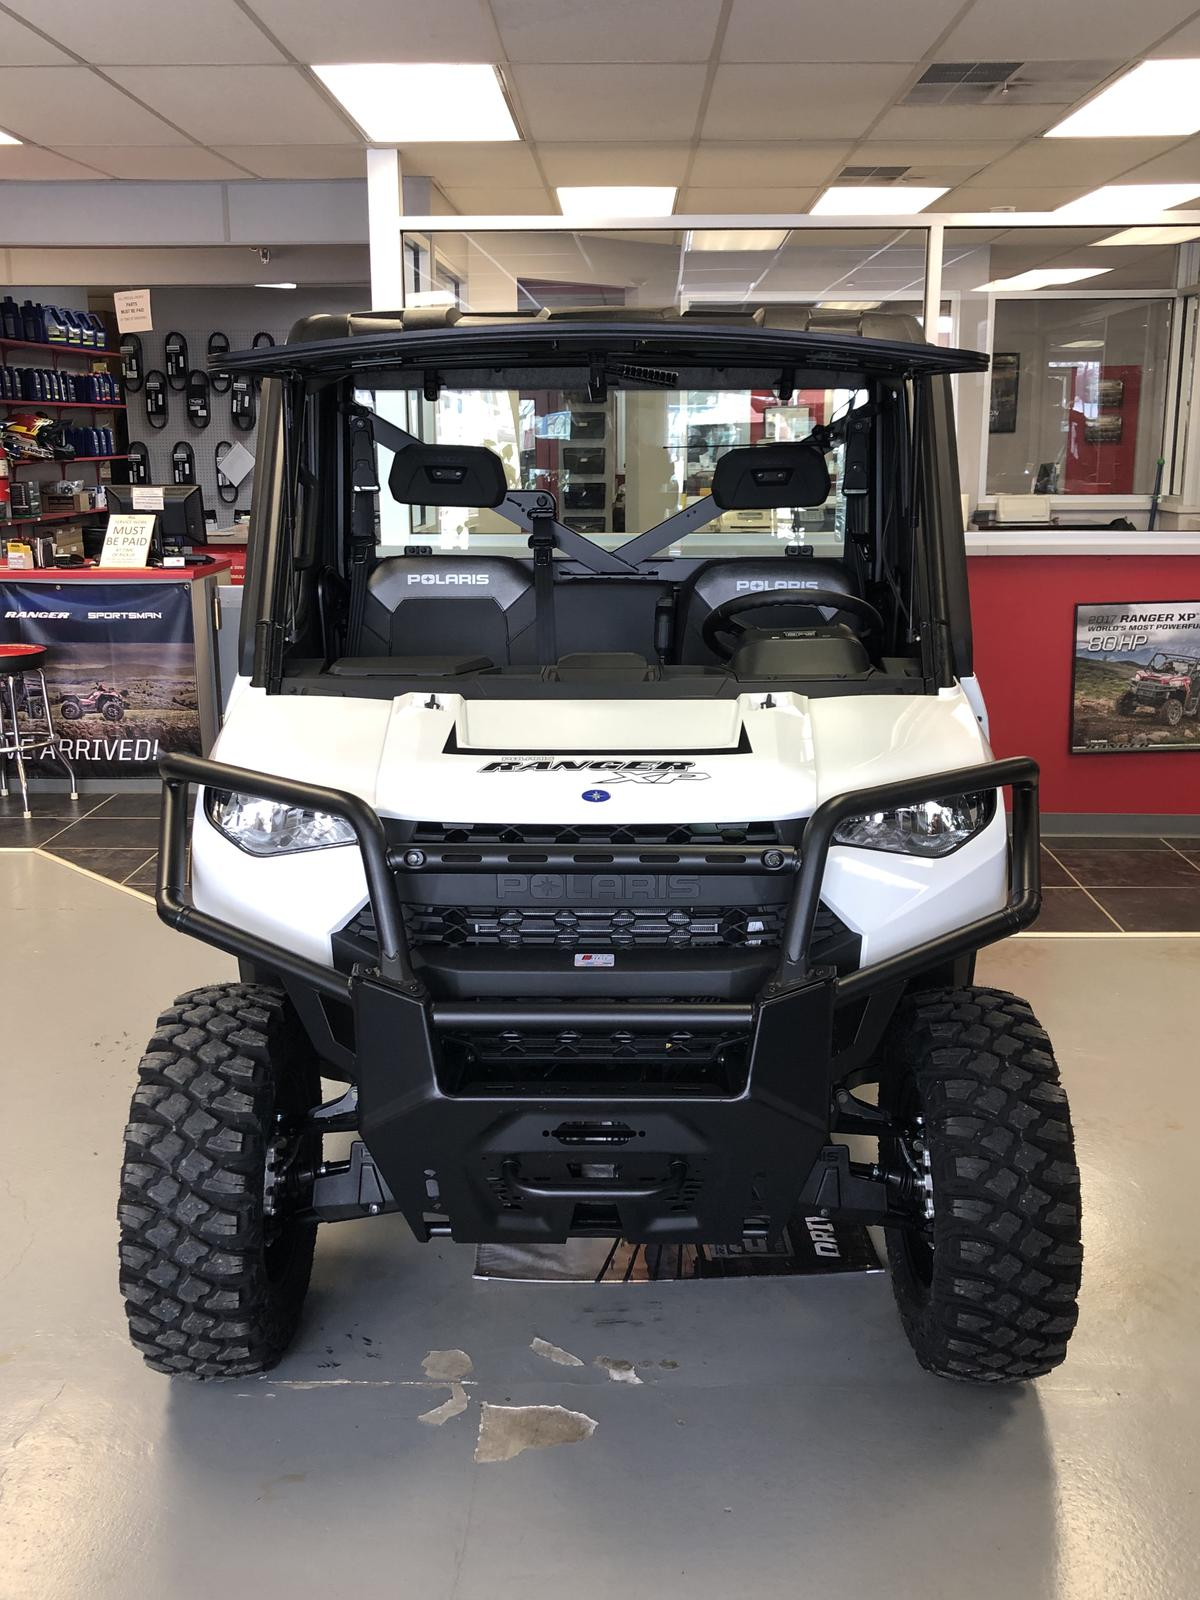 2019 Polaris Industries Ranger XP 1000